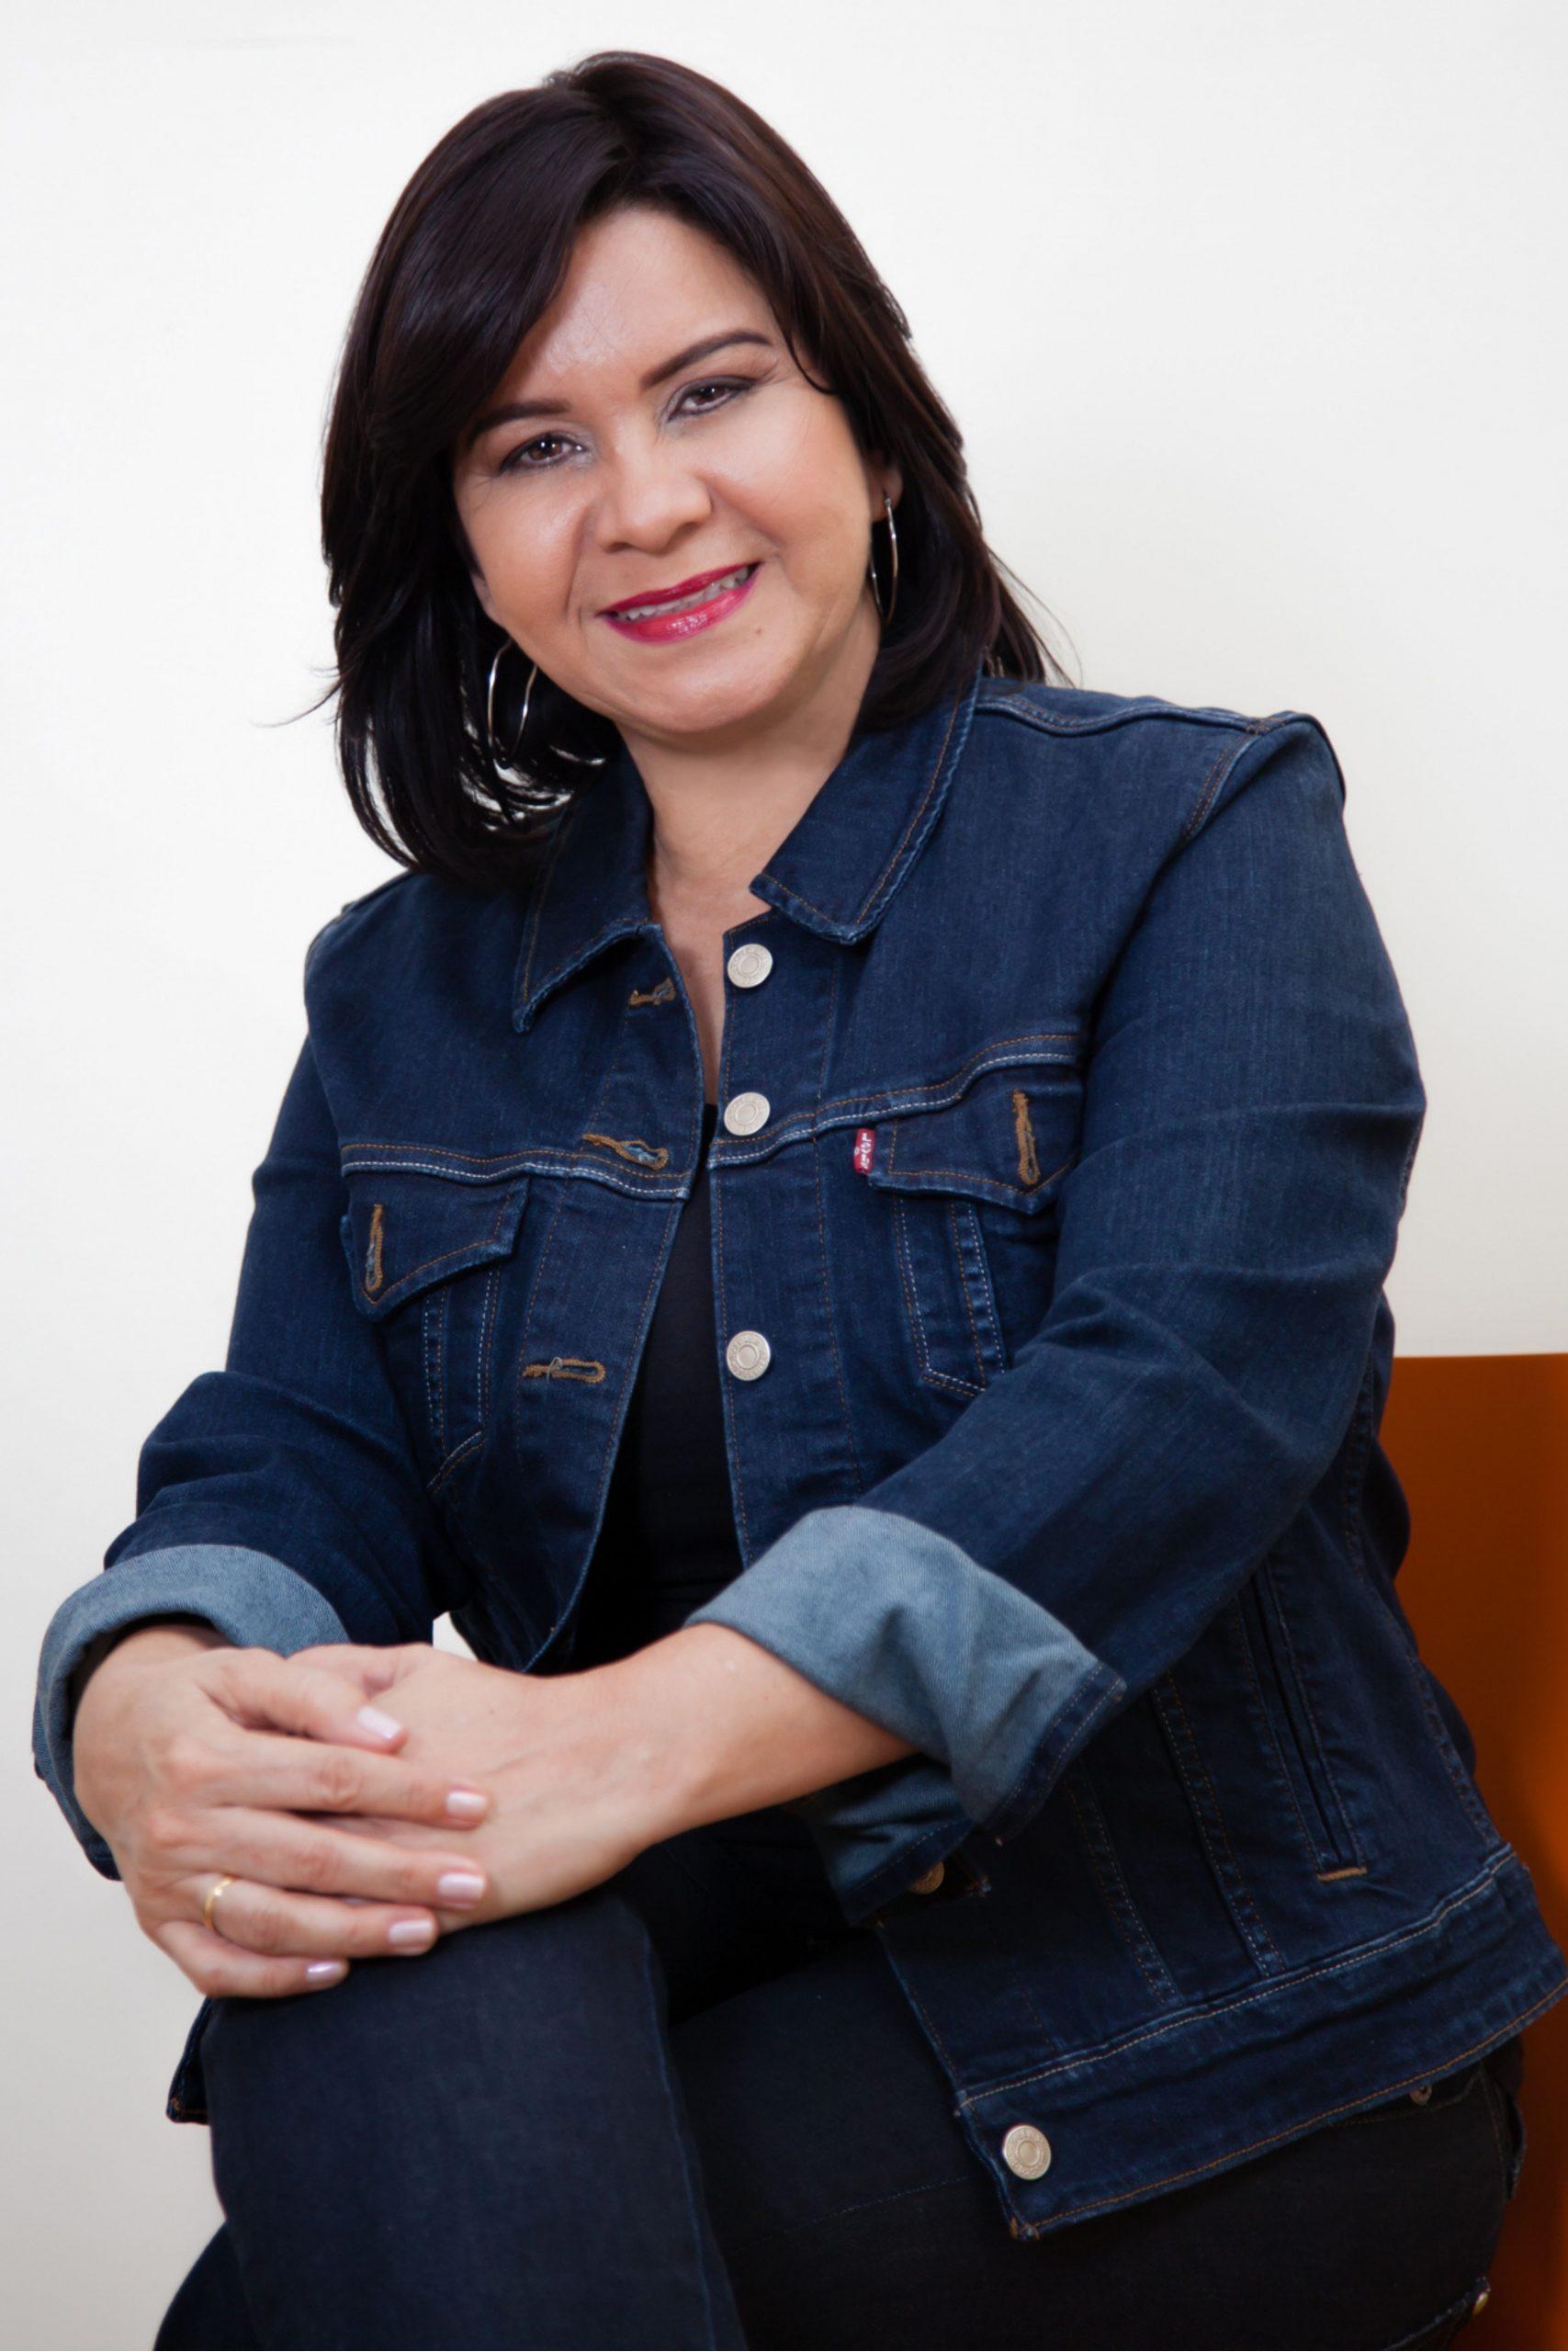 Gabriela Acacio